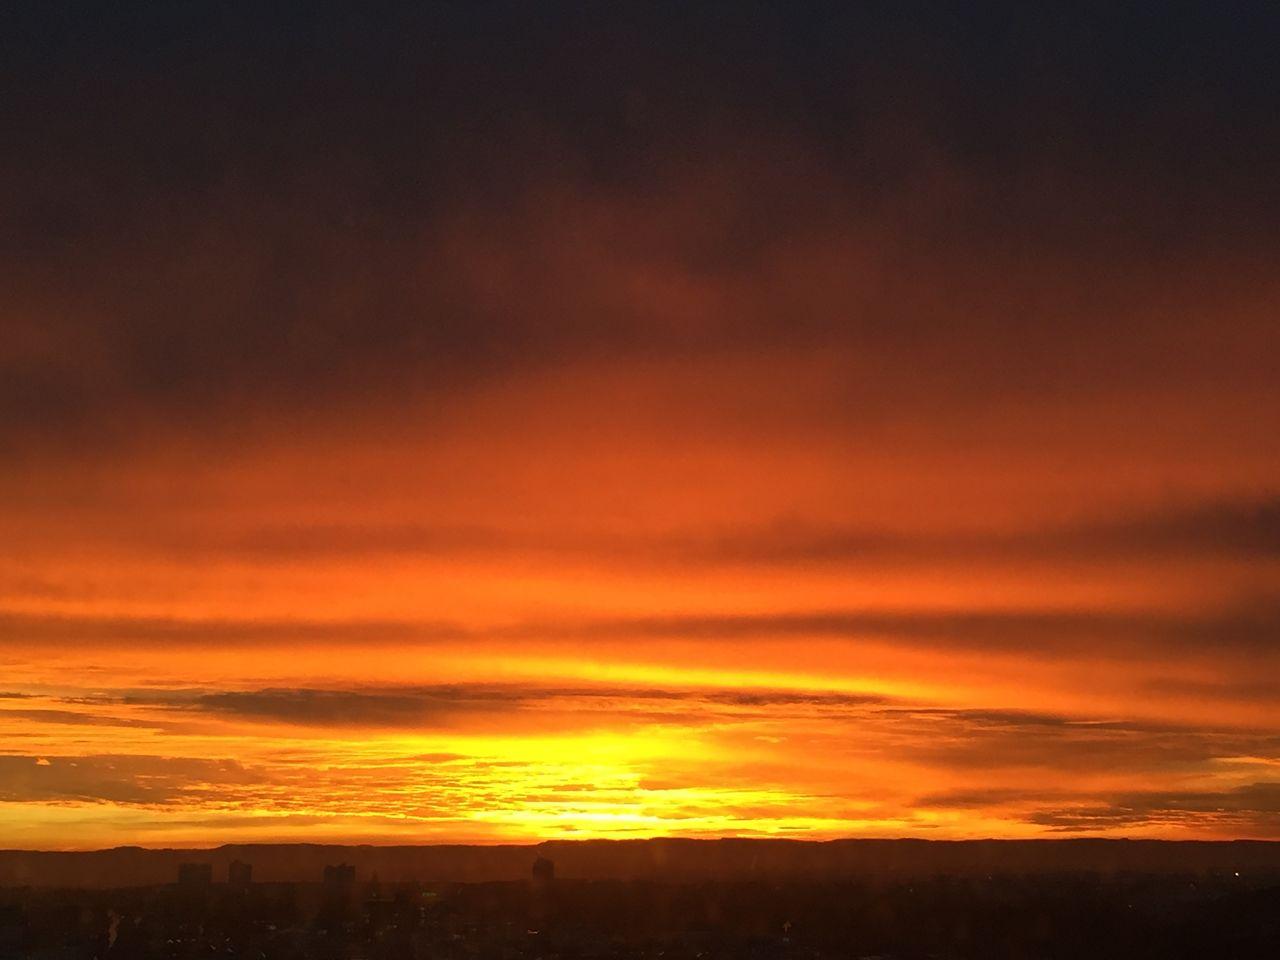 Sonnenaufgang 23.11. IMG_7531